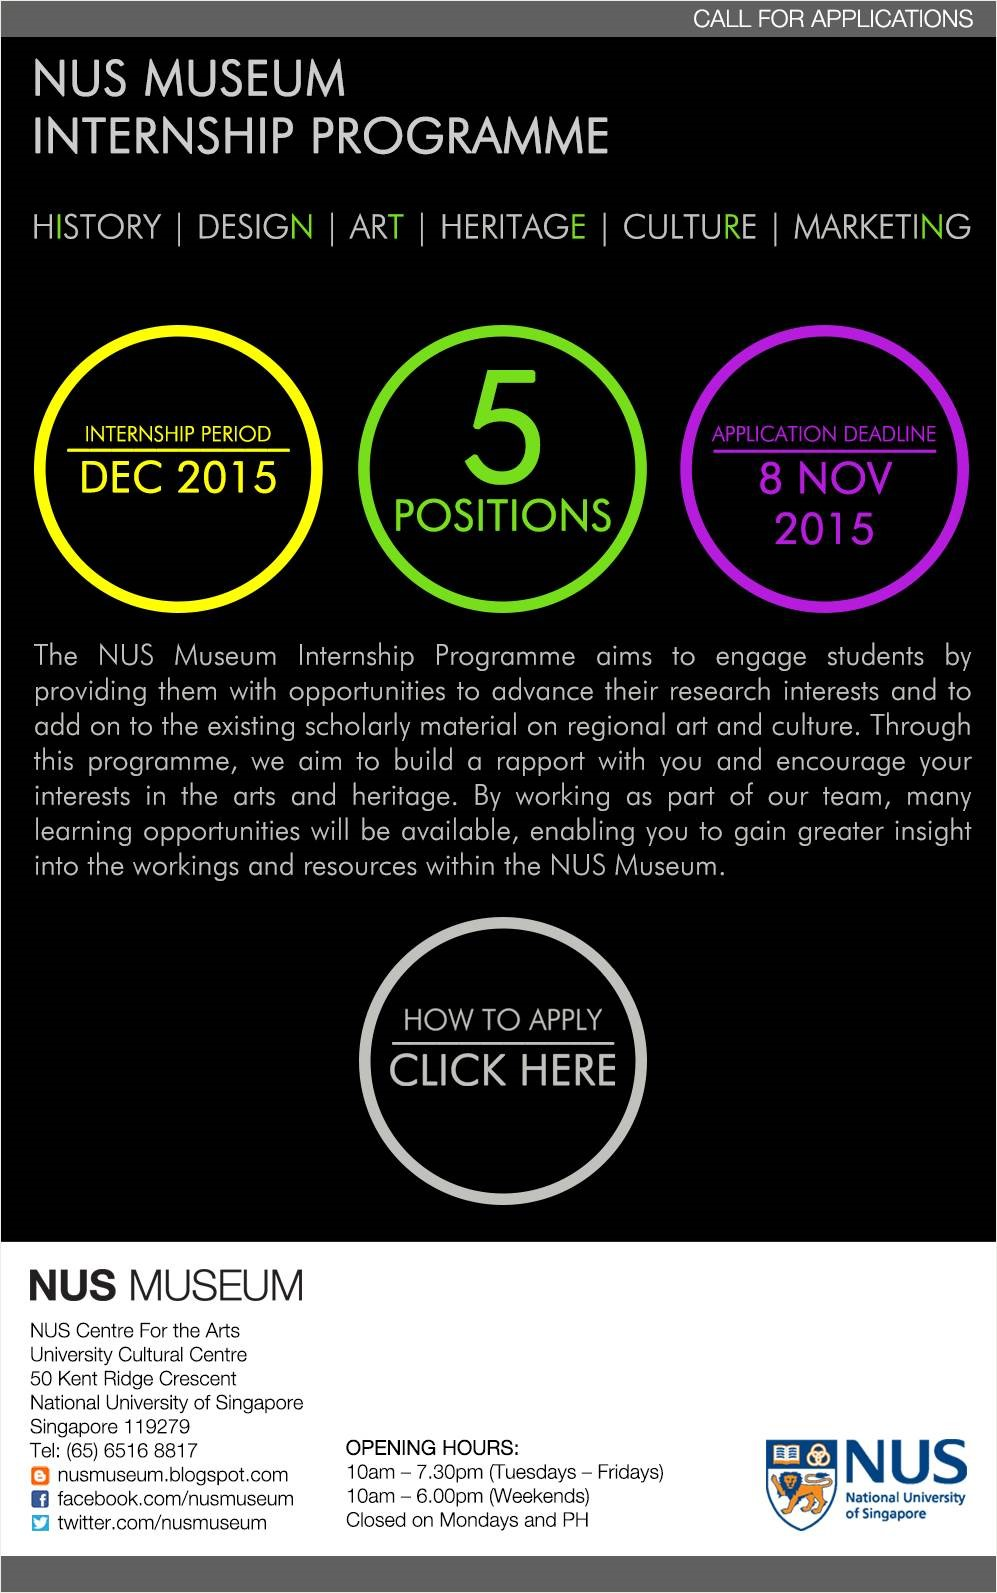 NUS Museum Internship Programme 2015